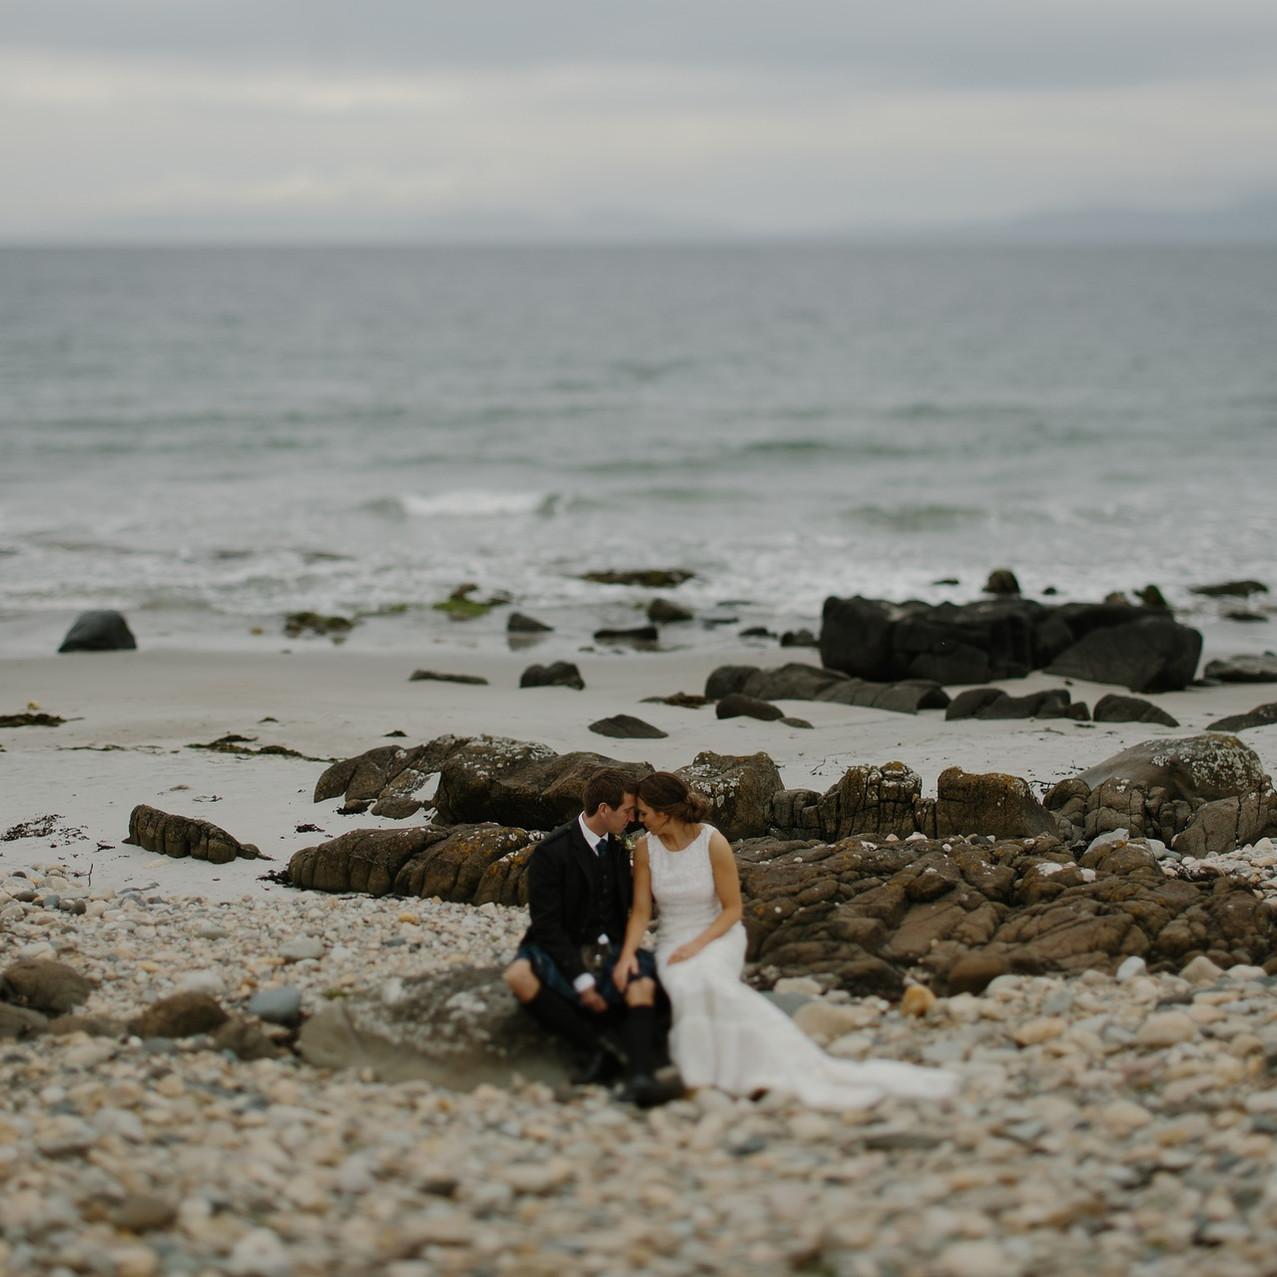 wedding-2245535_1920